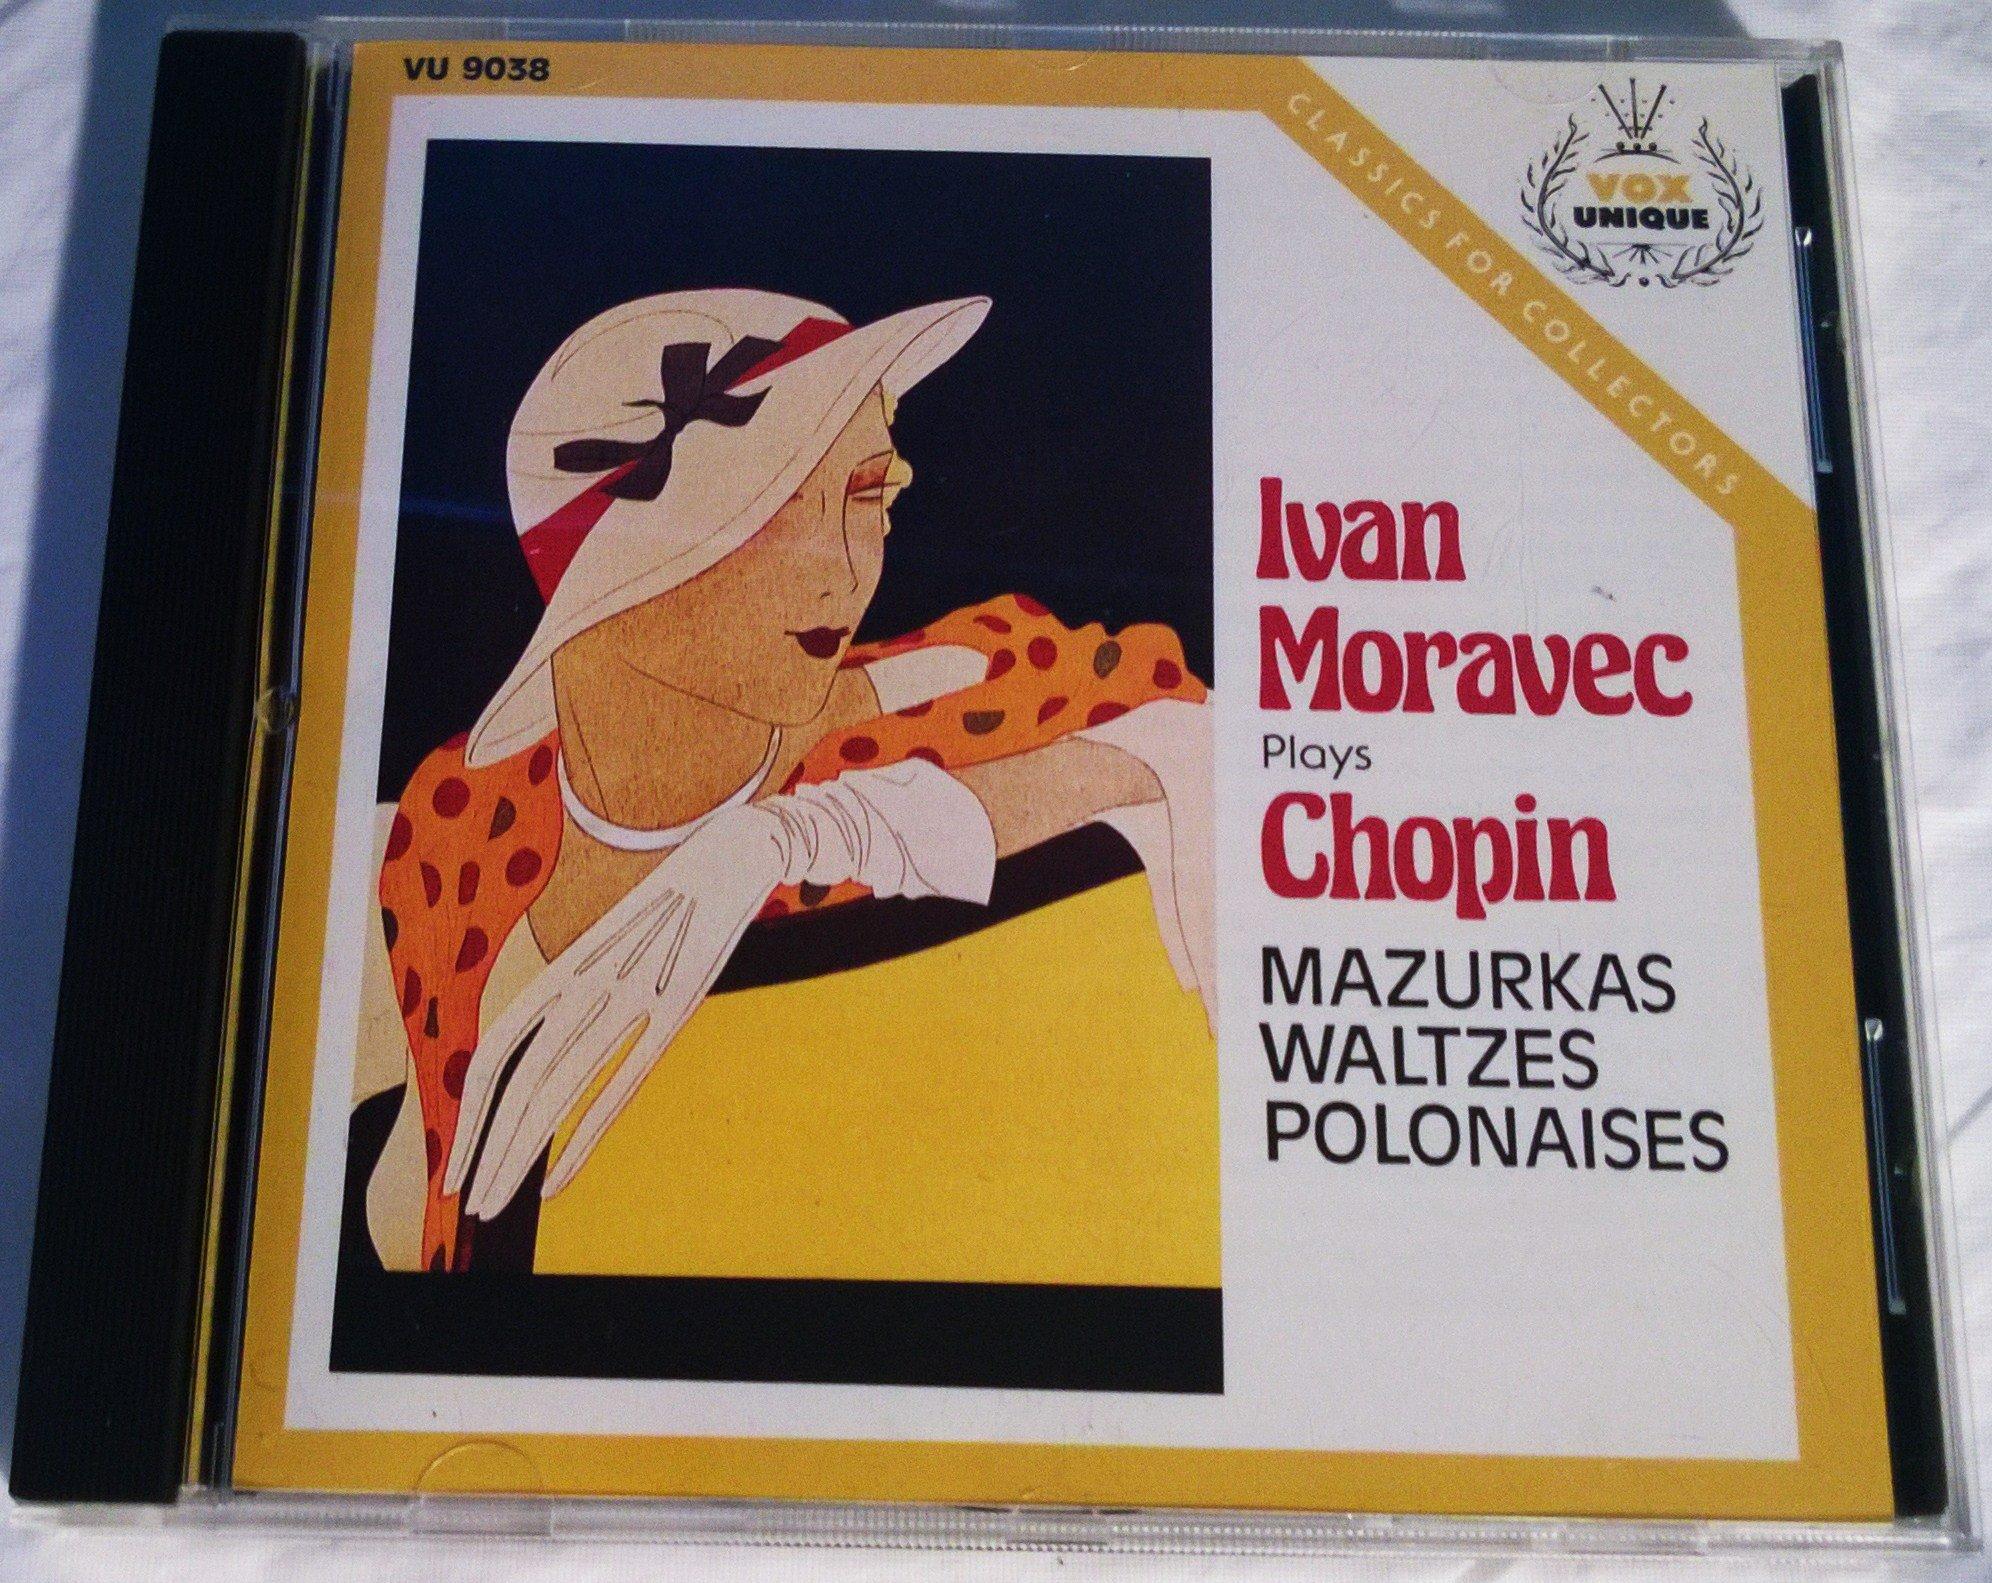 5 Mazurkas 3 Waltzes 2 Polonaises